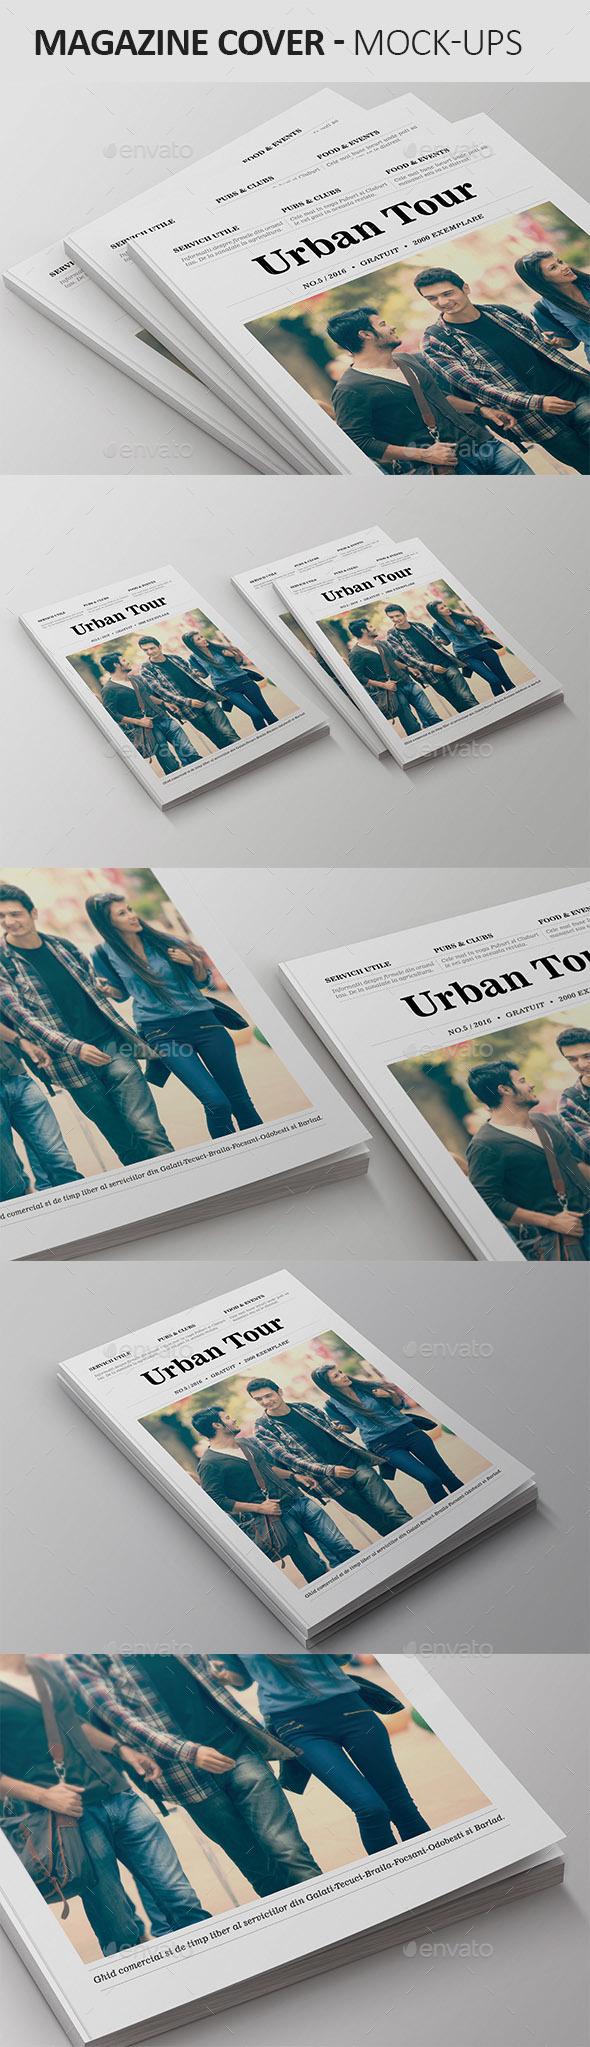 Magazine Cover Mock-Ups